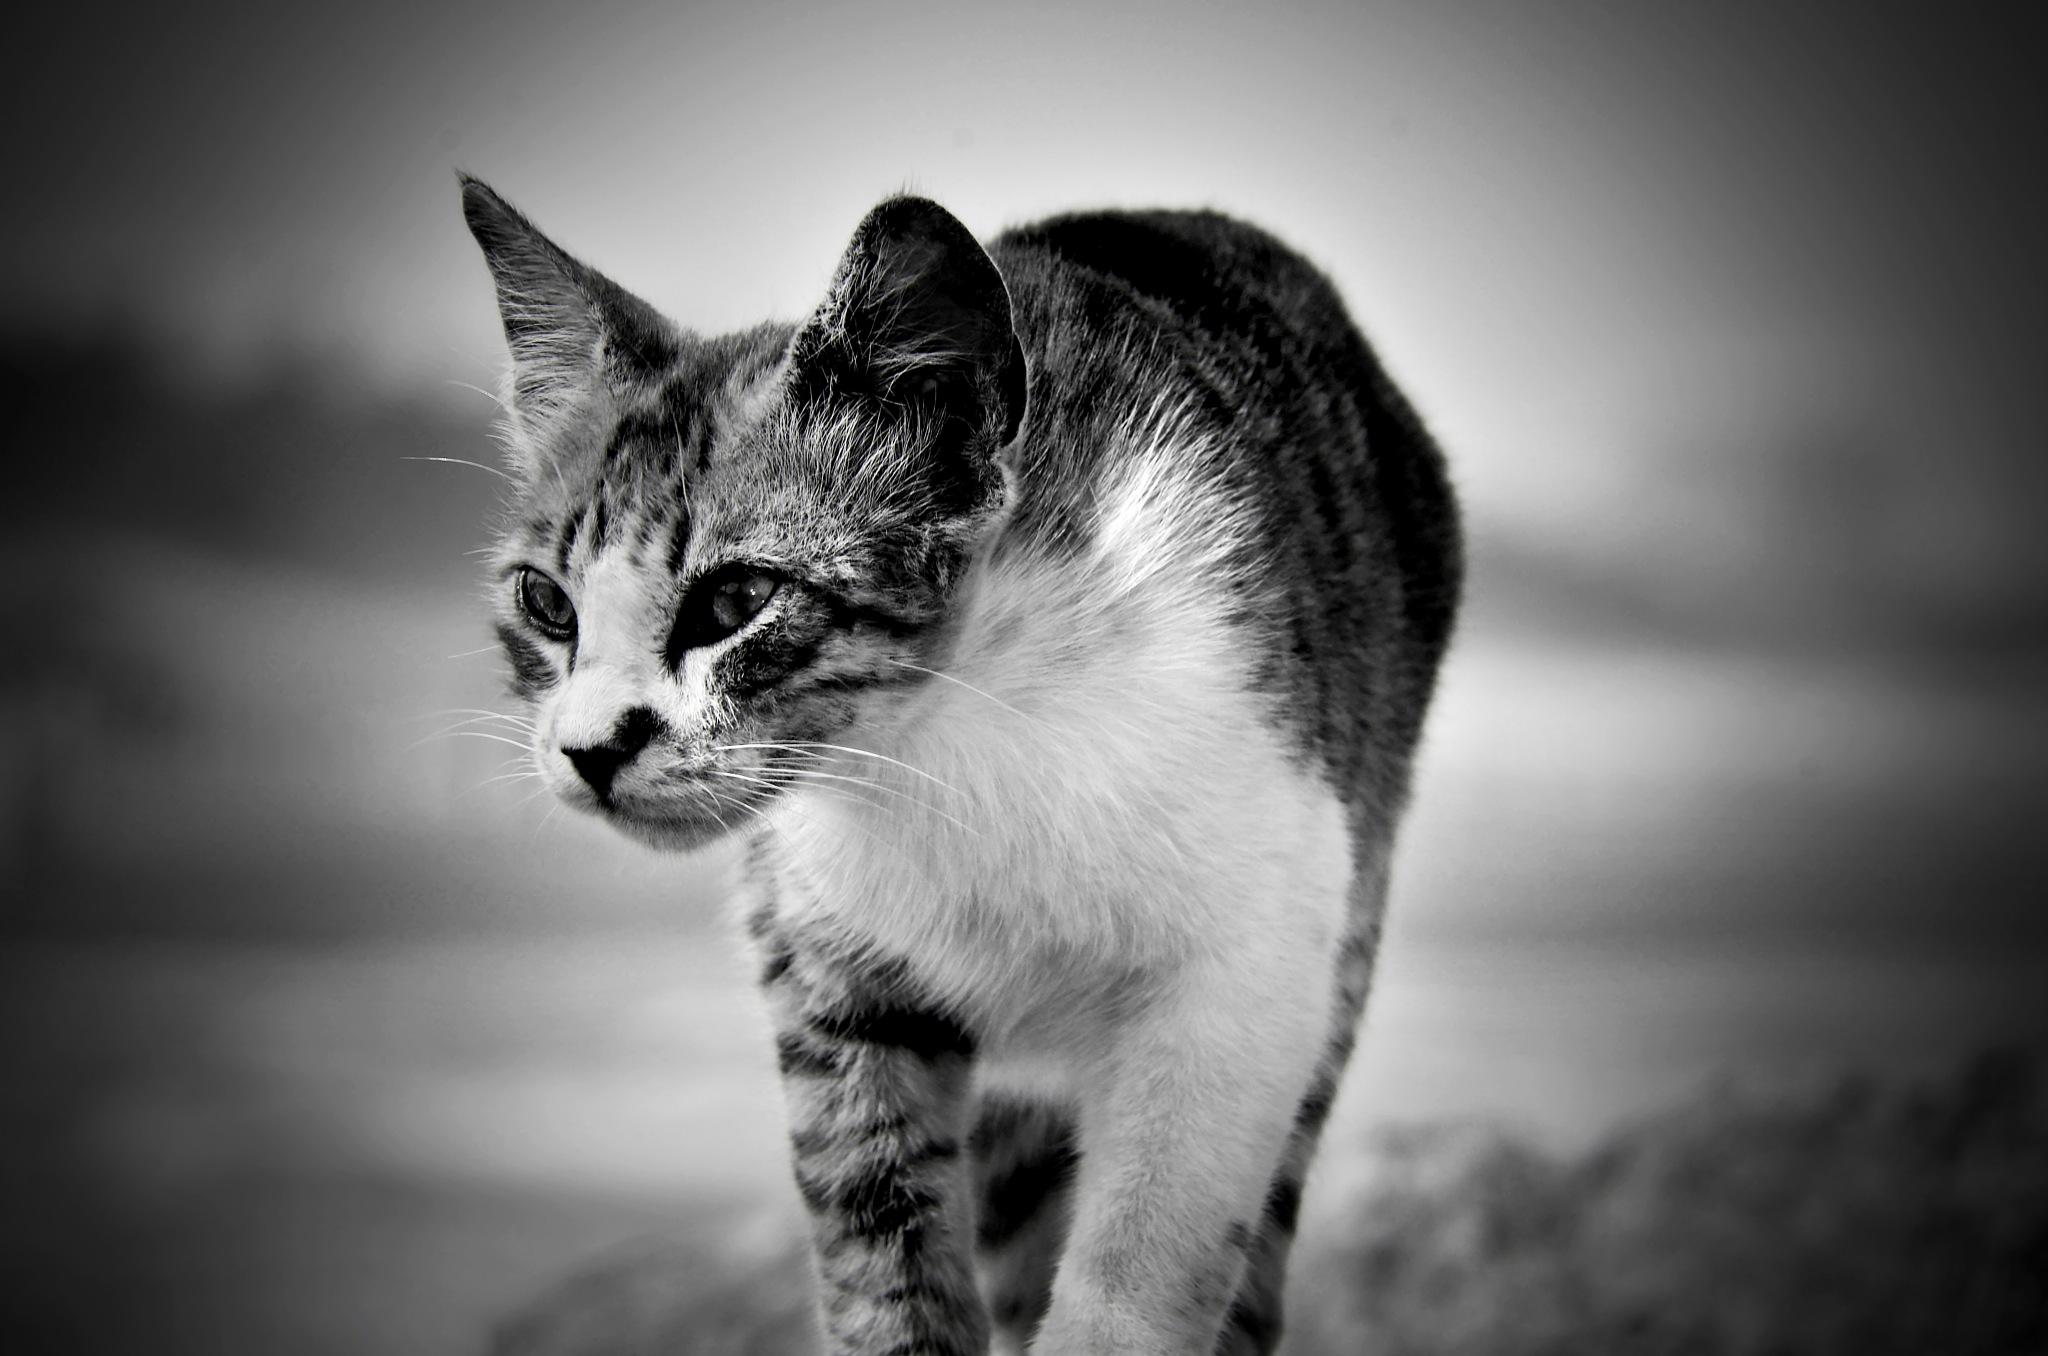 BW CAT by Moshe Harosh